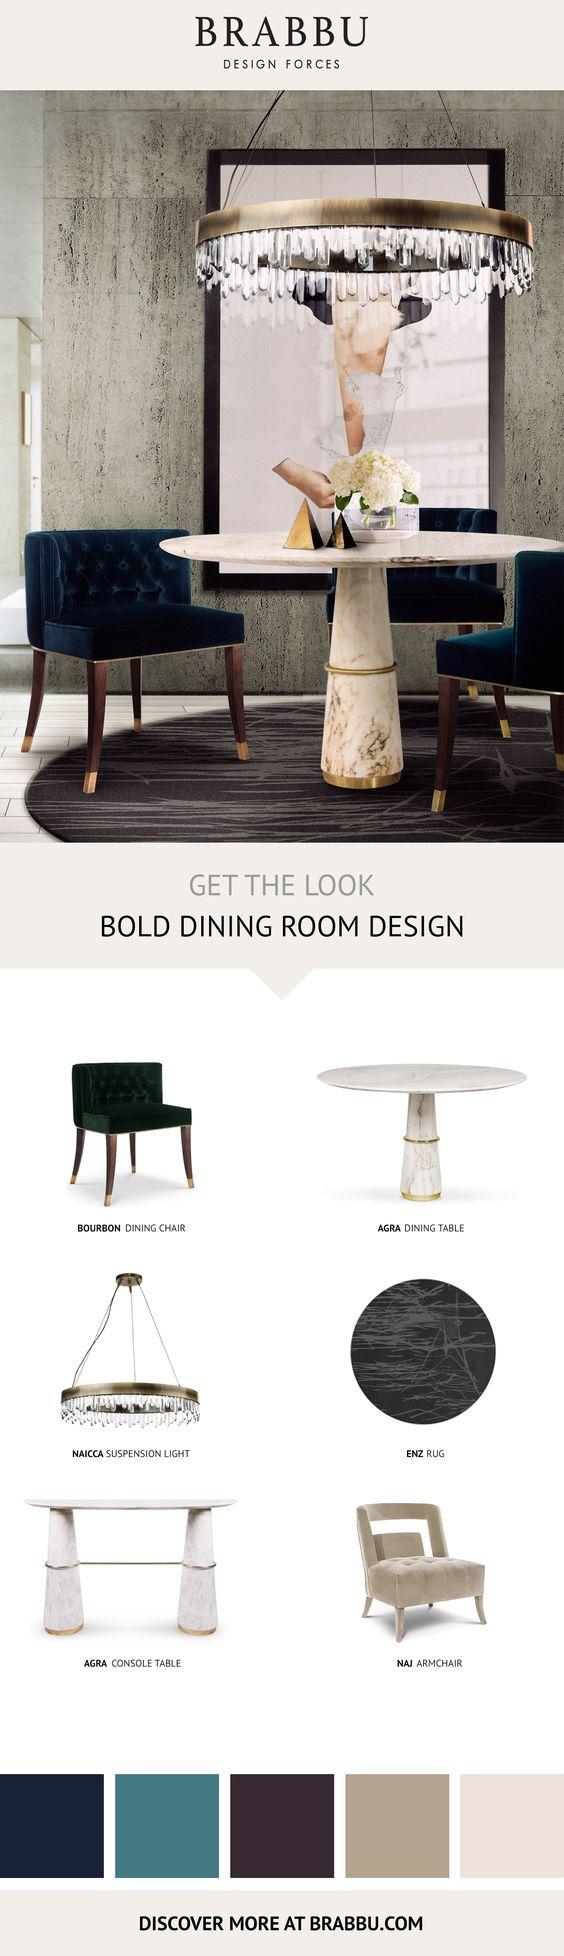 5 Outstanding Interior Design Tips To Always Have in Mind  5 Outstanding Interior Design Tips To Always Have in Mind! 5 Outstanding Interior Design Tips To Always Have in Mind! bold dinig room design